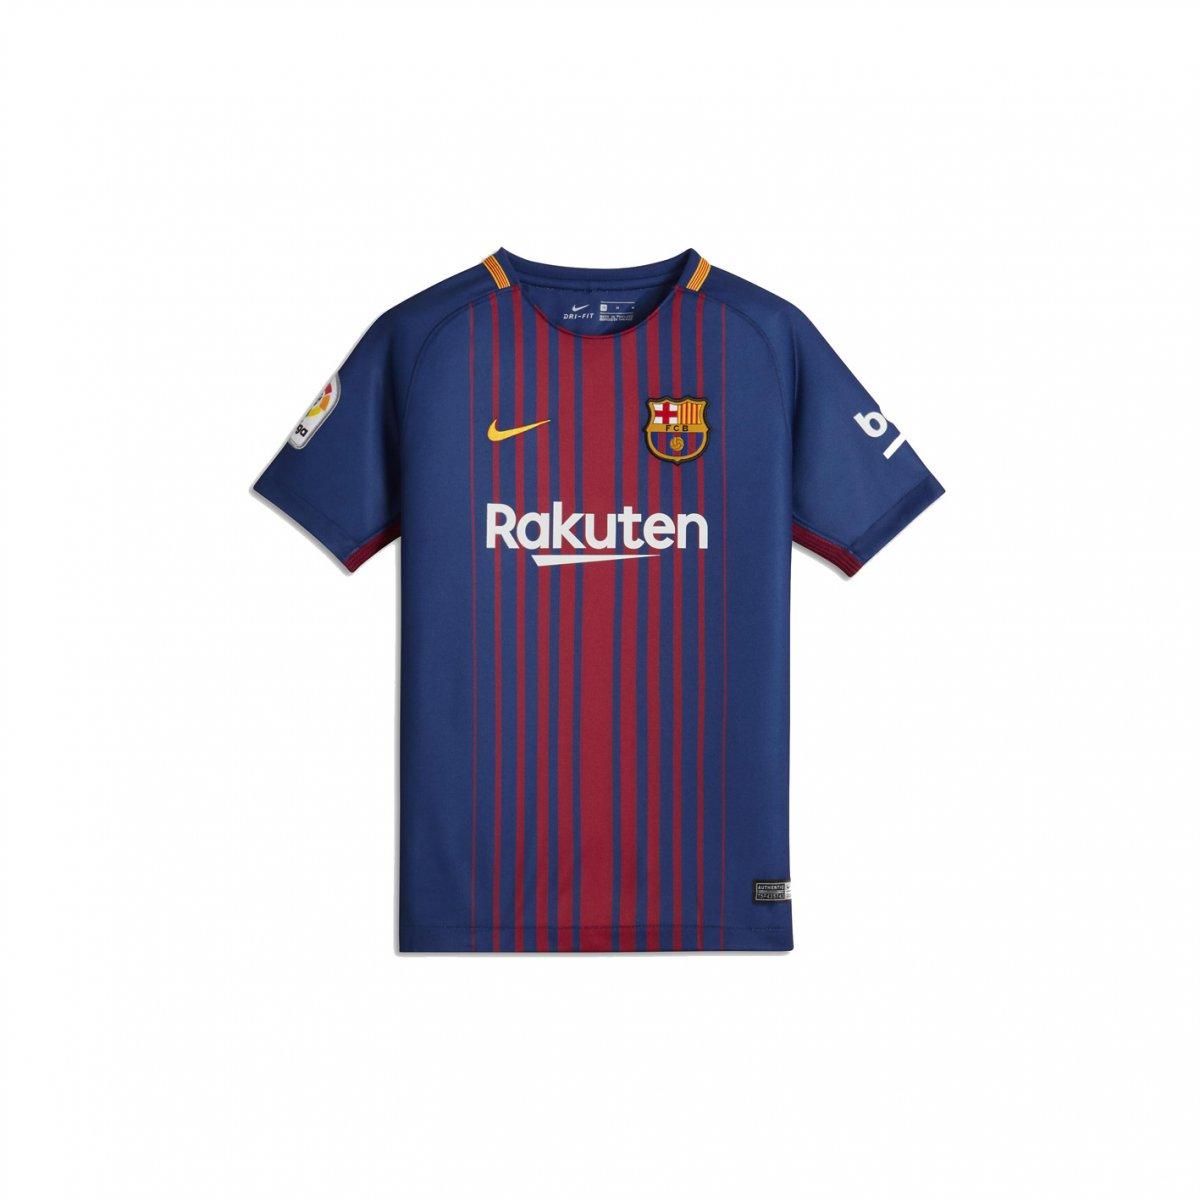 ec92a80aafdd9 Camiseta Infantil Nike Barcelona Dry Stadium Home 2017 18 (Com Logo) 847387-